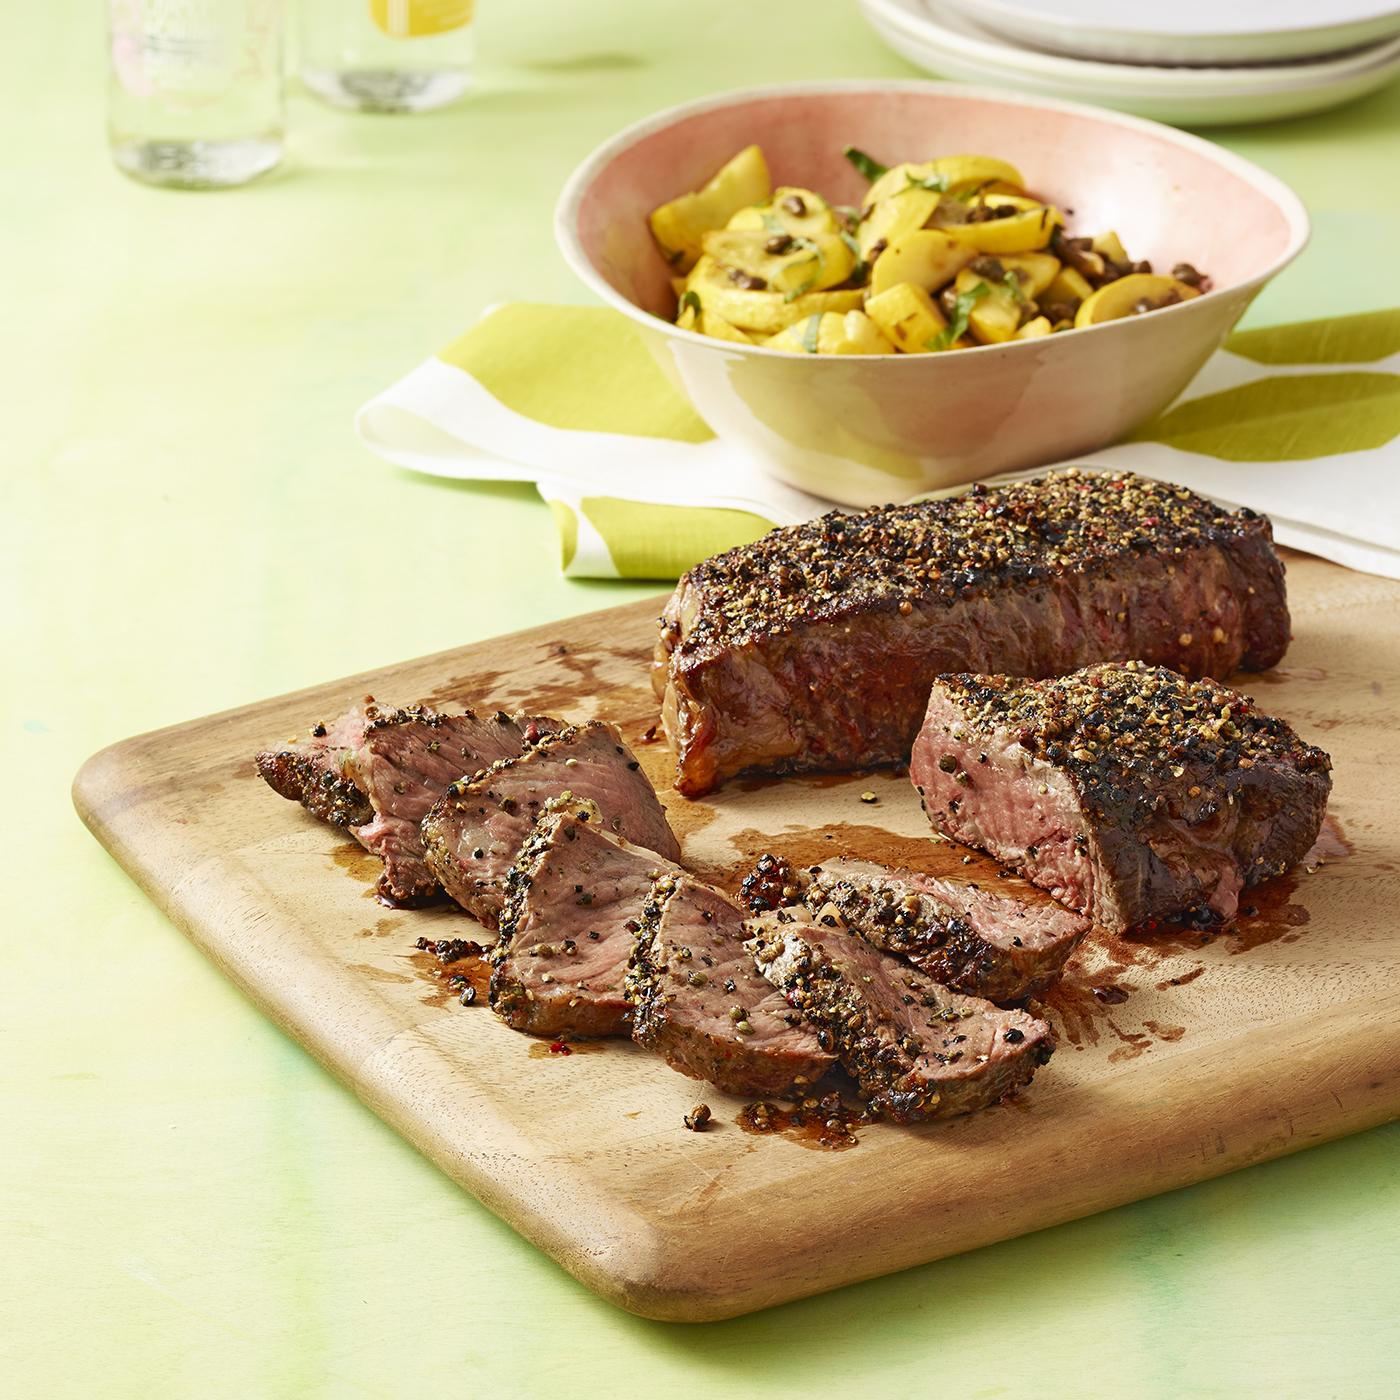 coriander-crusted steak with squash